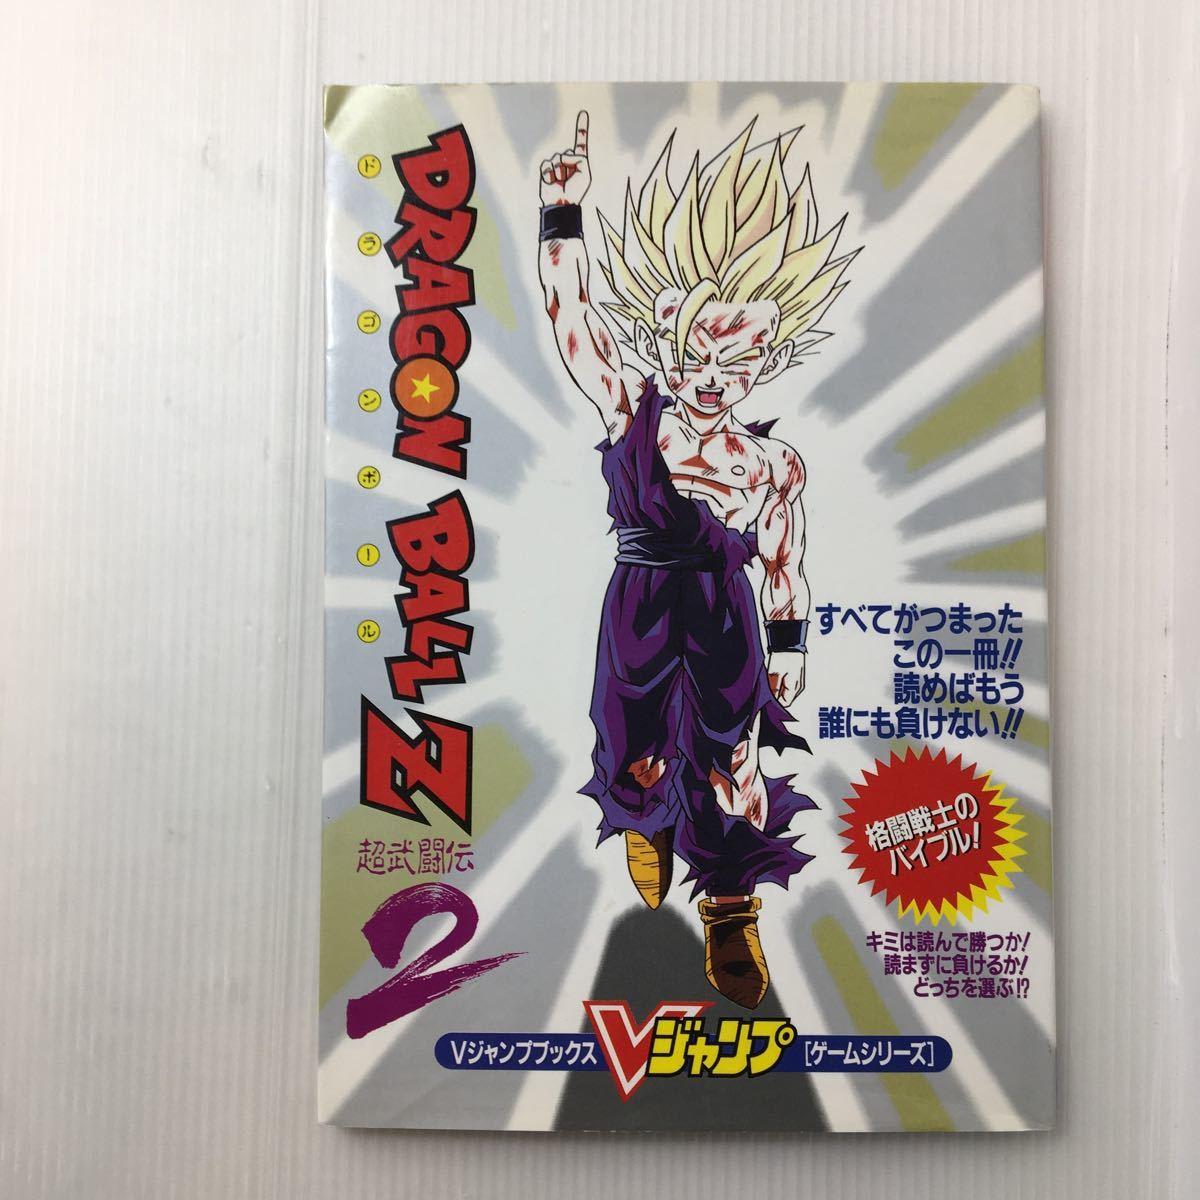 zaa-062★Vジャンプブックス[ゲームシリーズ]ドラゴンボールZ超武勇伝2 雑誌 1993/1/1 集英社 (編集)